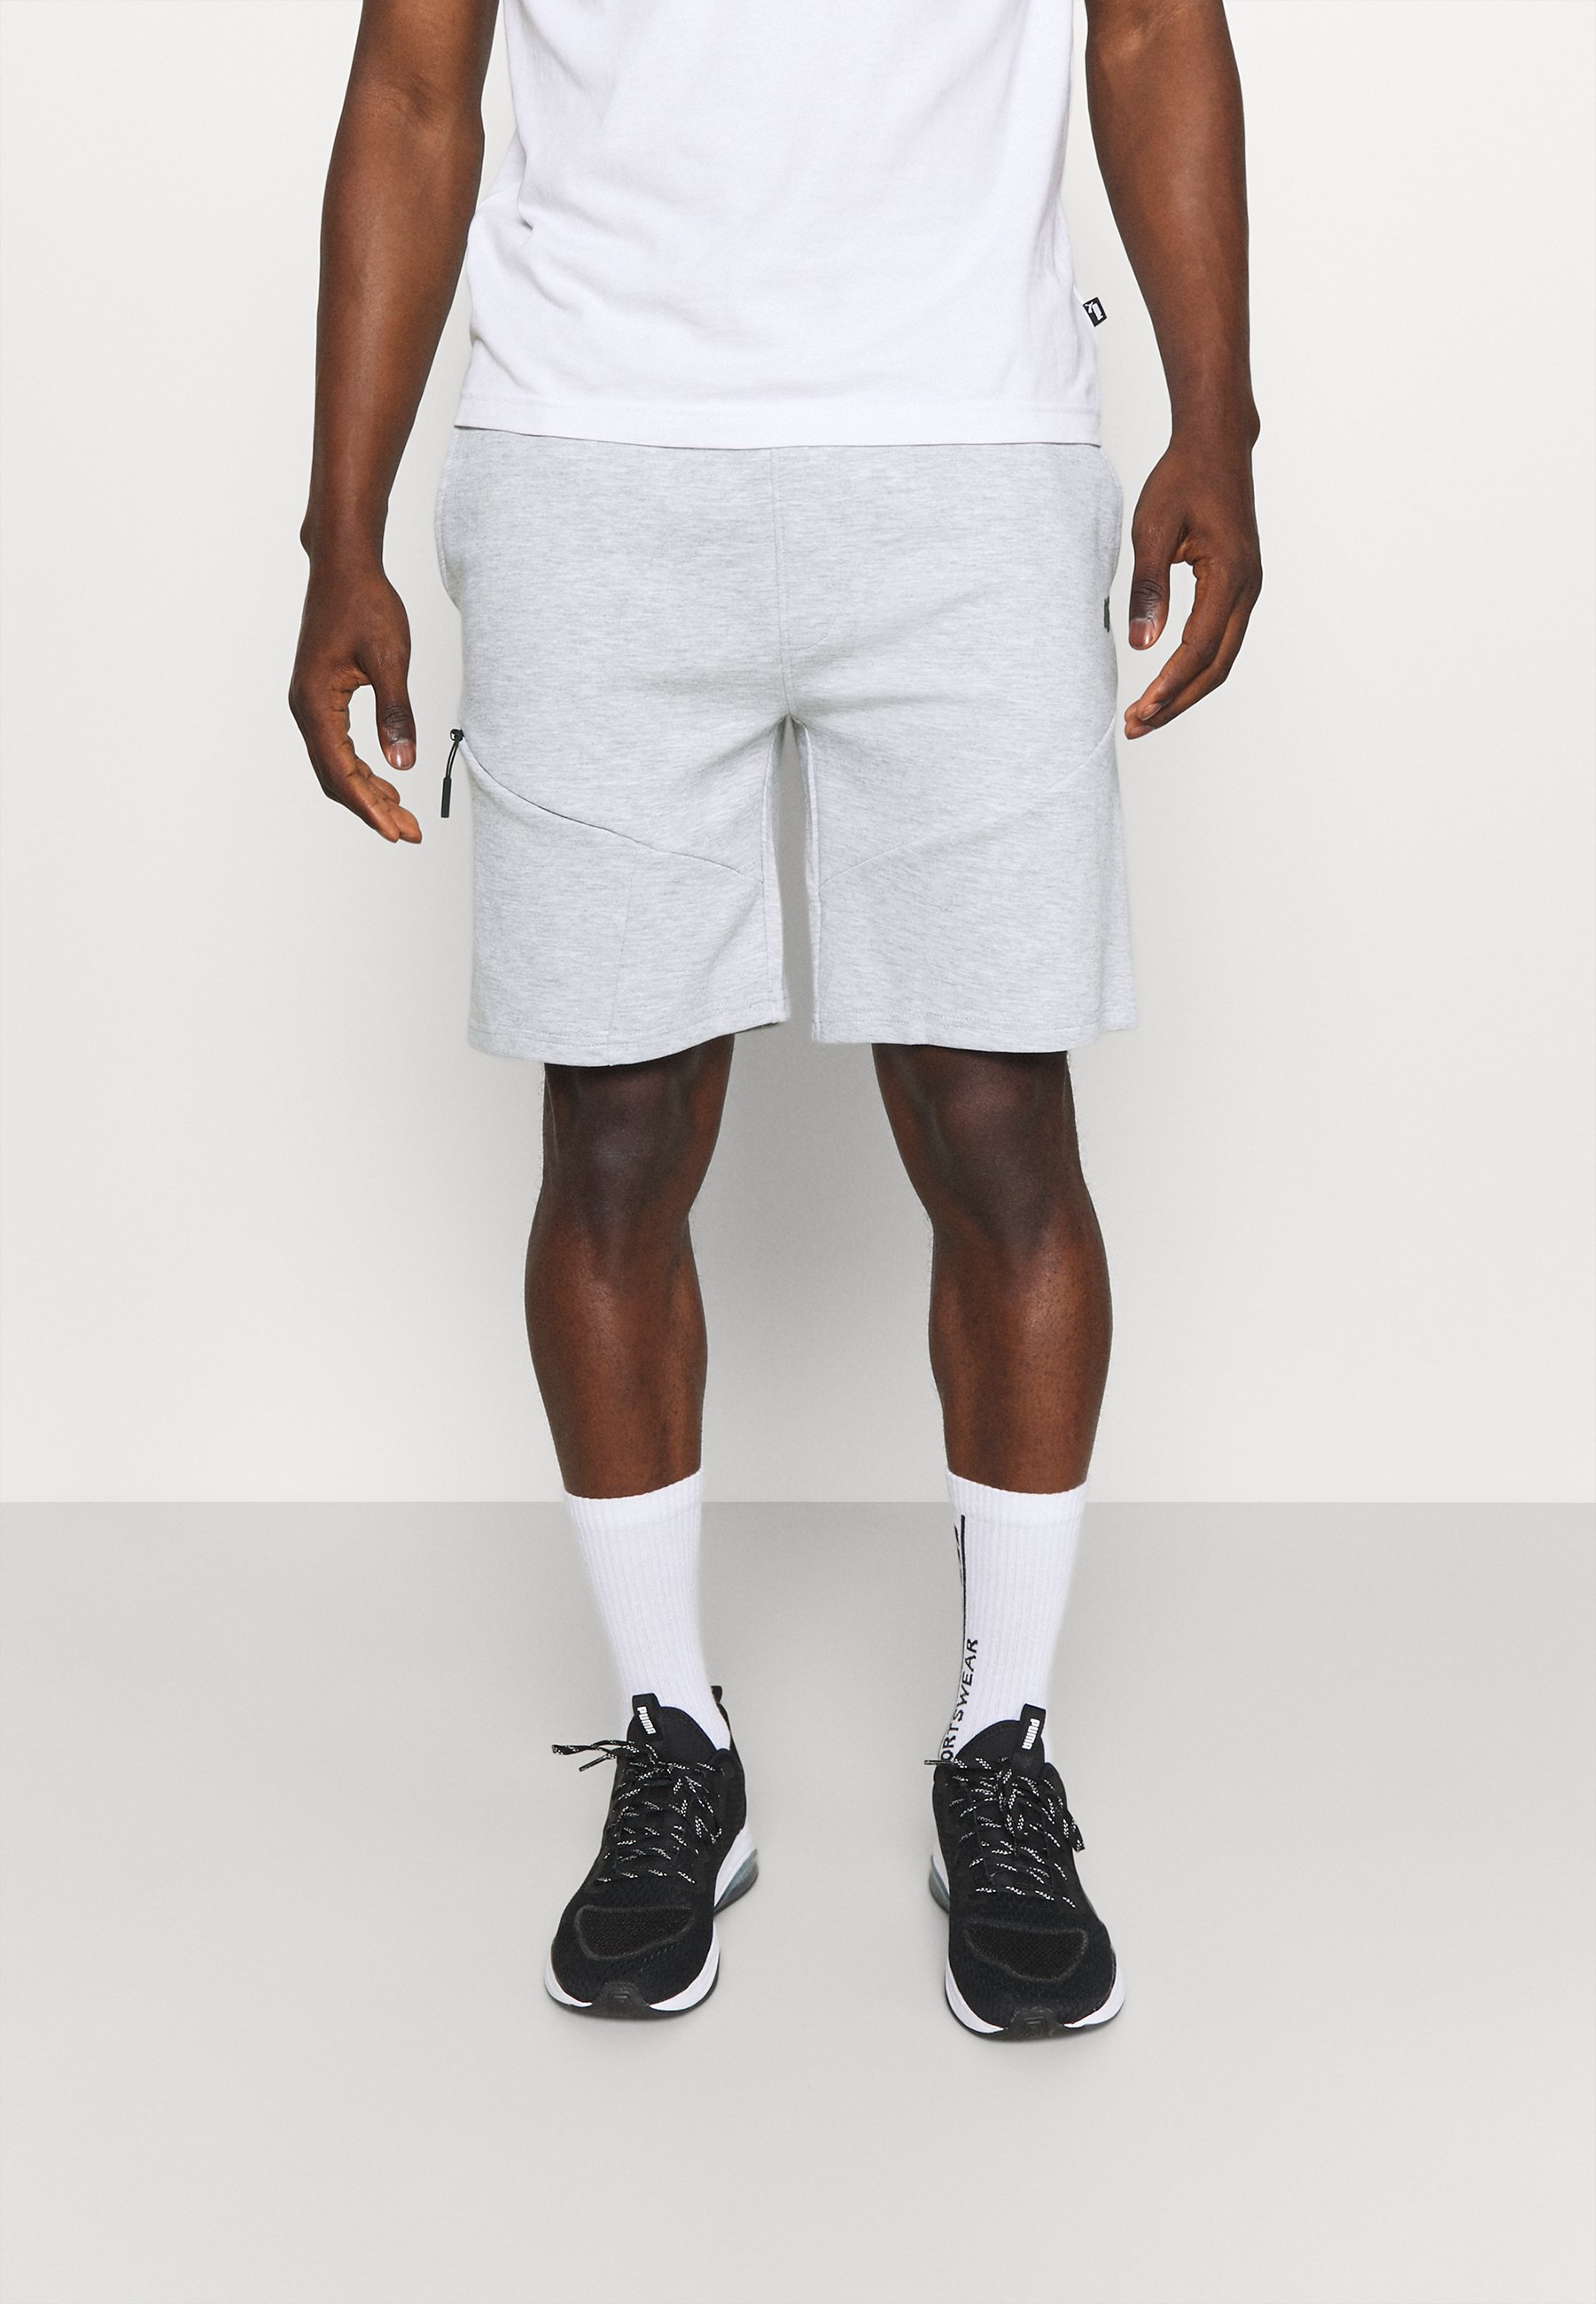 Men Men's shorts - Sports shorts